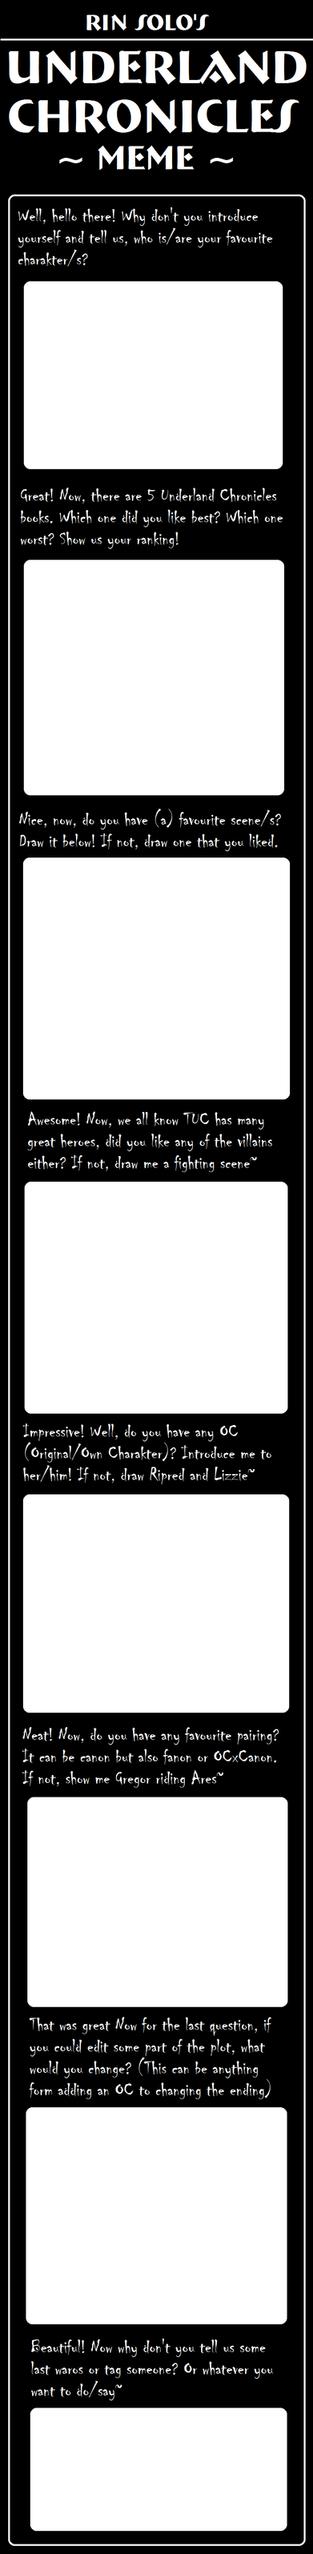 RIN SOLO: Underland Chronicles MEME by DarkPrincess116